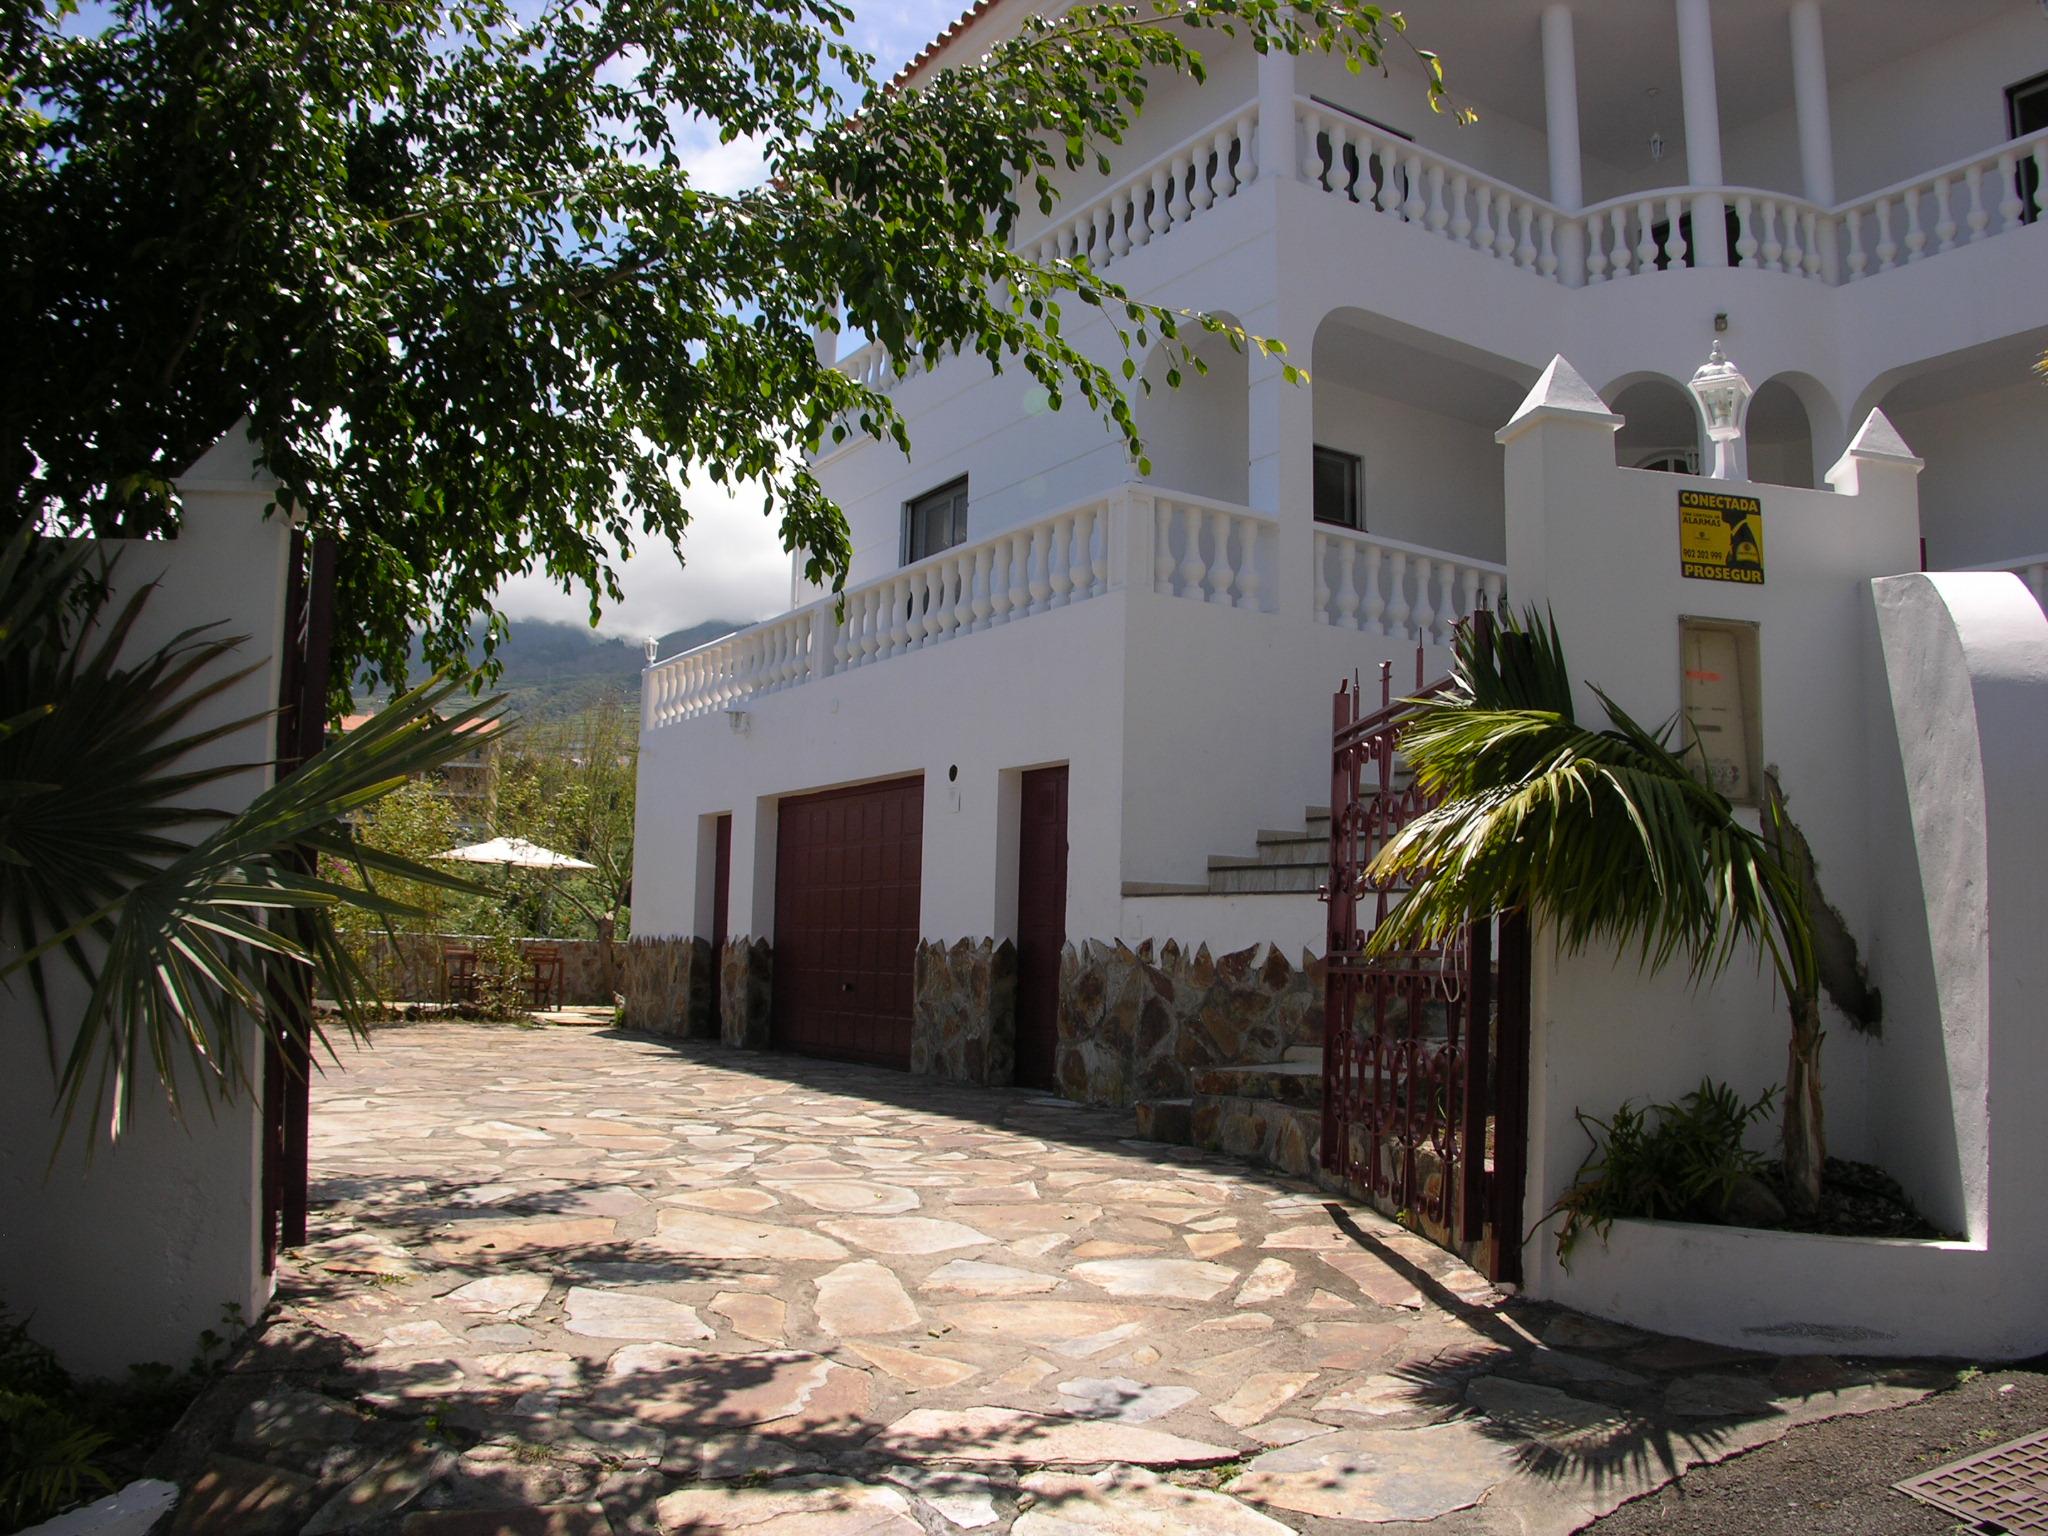 Maison de vacances Villa Vista La Quinta beheizbarer Pool kostenloses WLAN Grill (2124407), Santa Ursula, Ténérife, Iles Canaries, Espagne, image 56